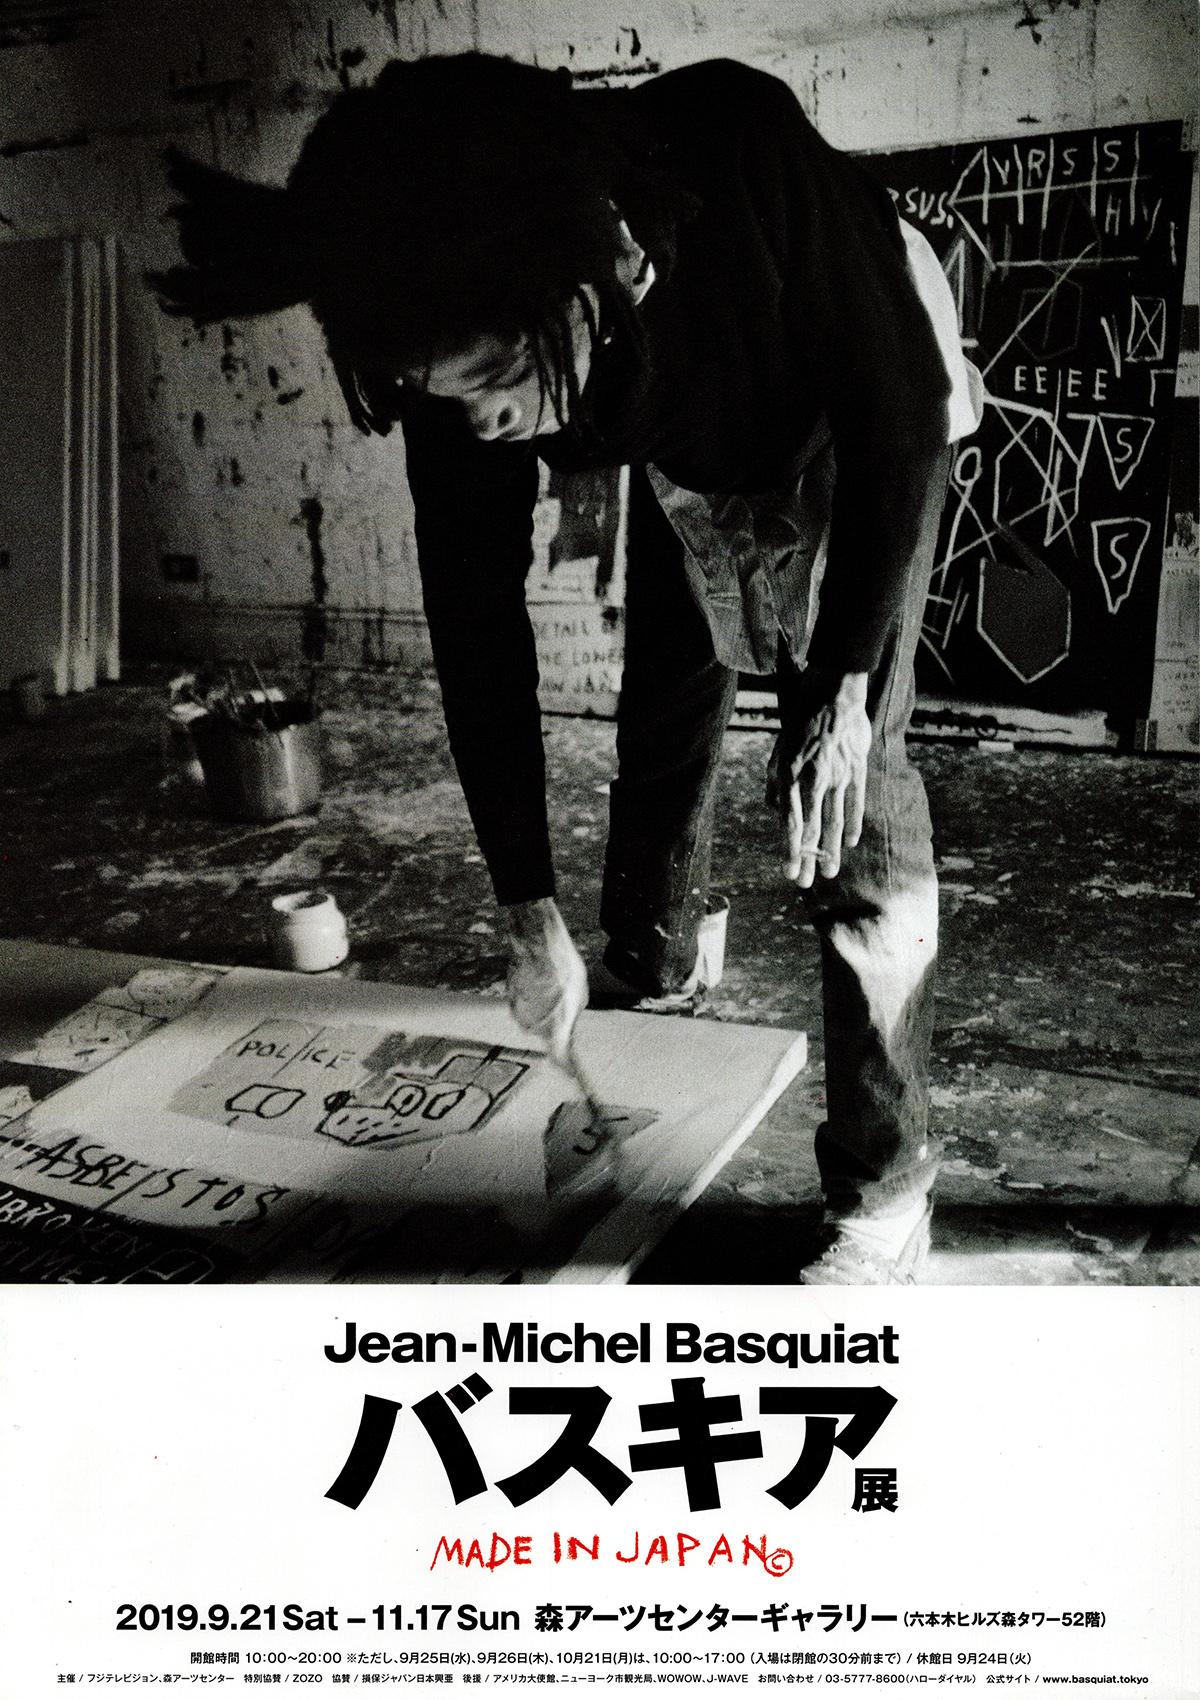 191113_basquiat4.jpg